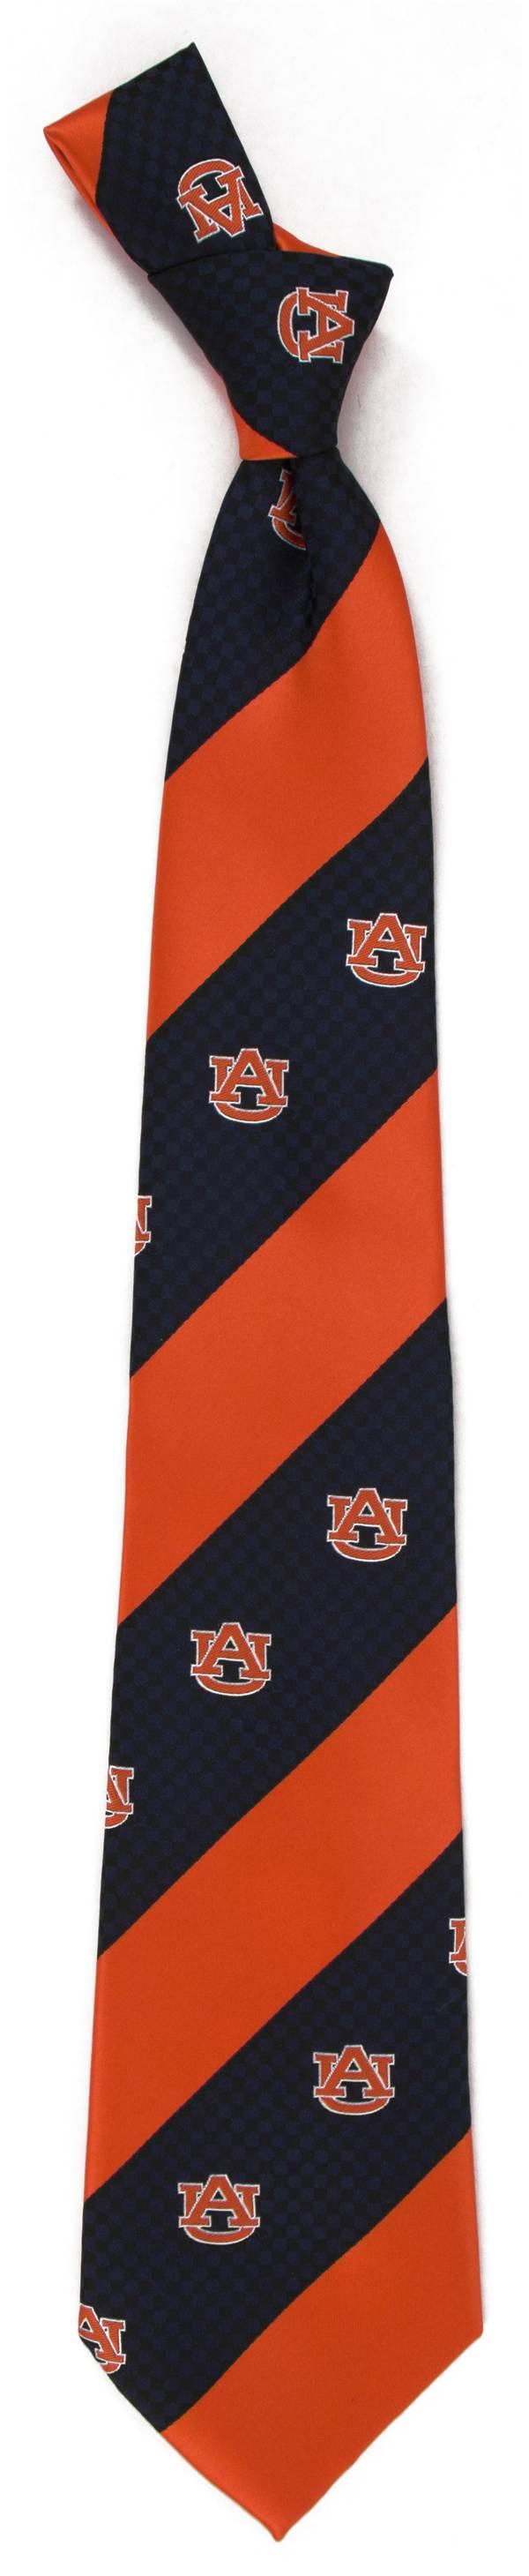 Eagles Wings Auburn Tigers Geo Stripe Necktie product image